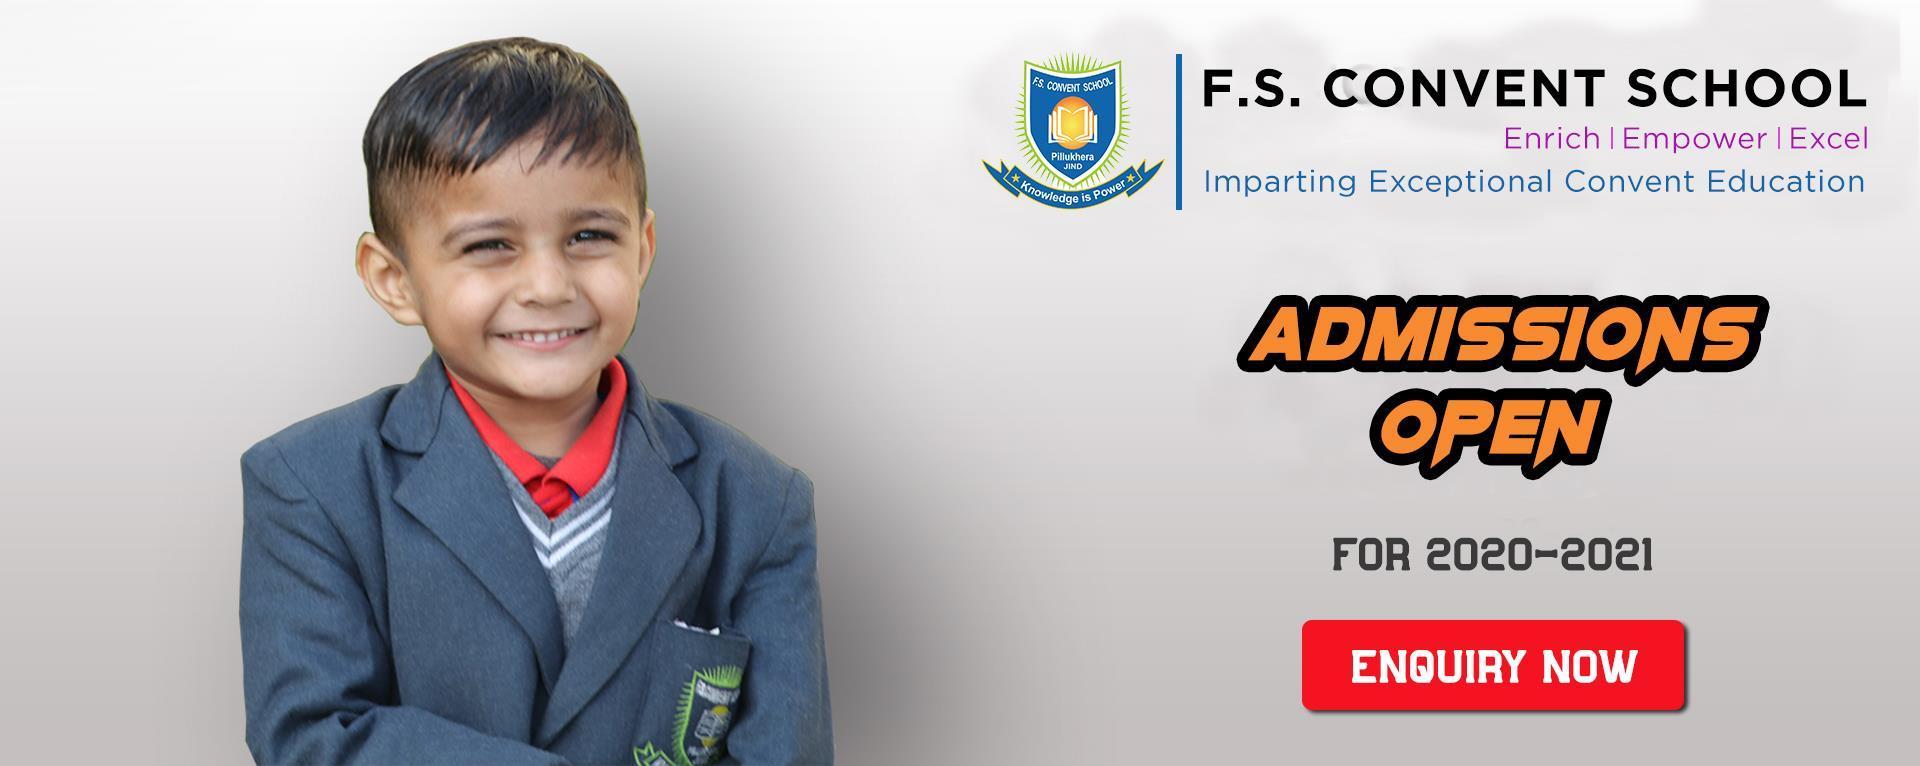 F. S. Convent School